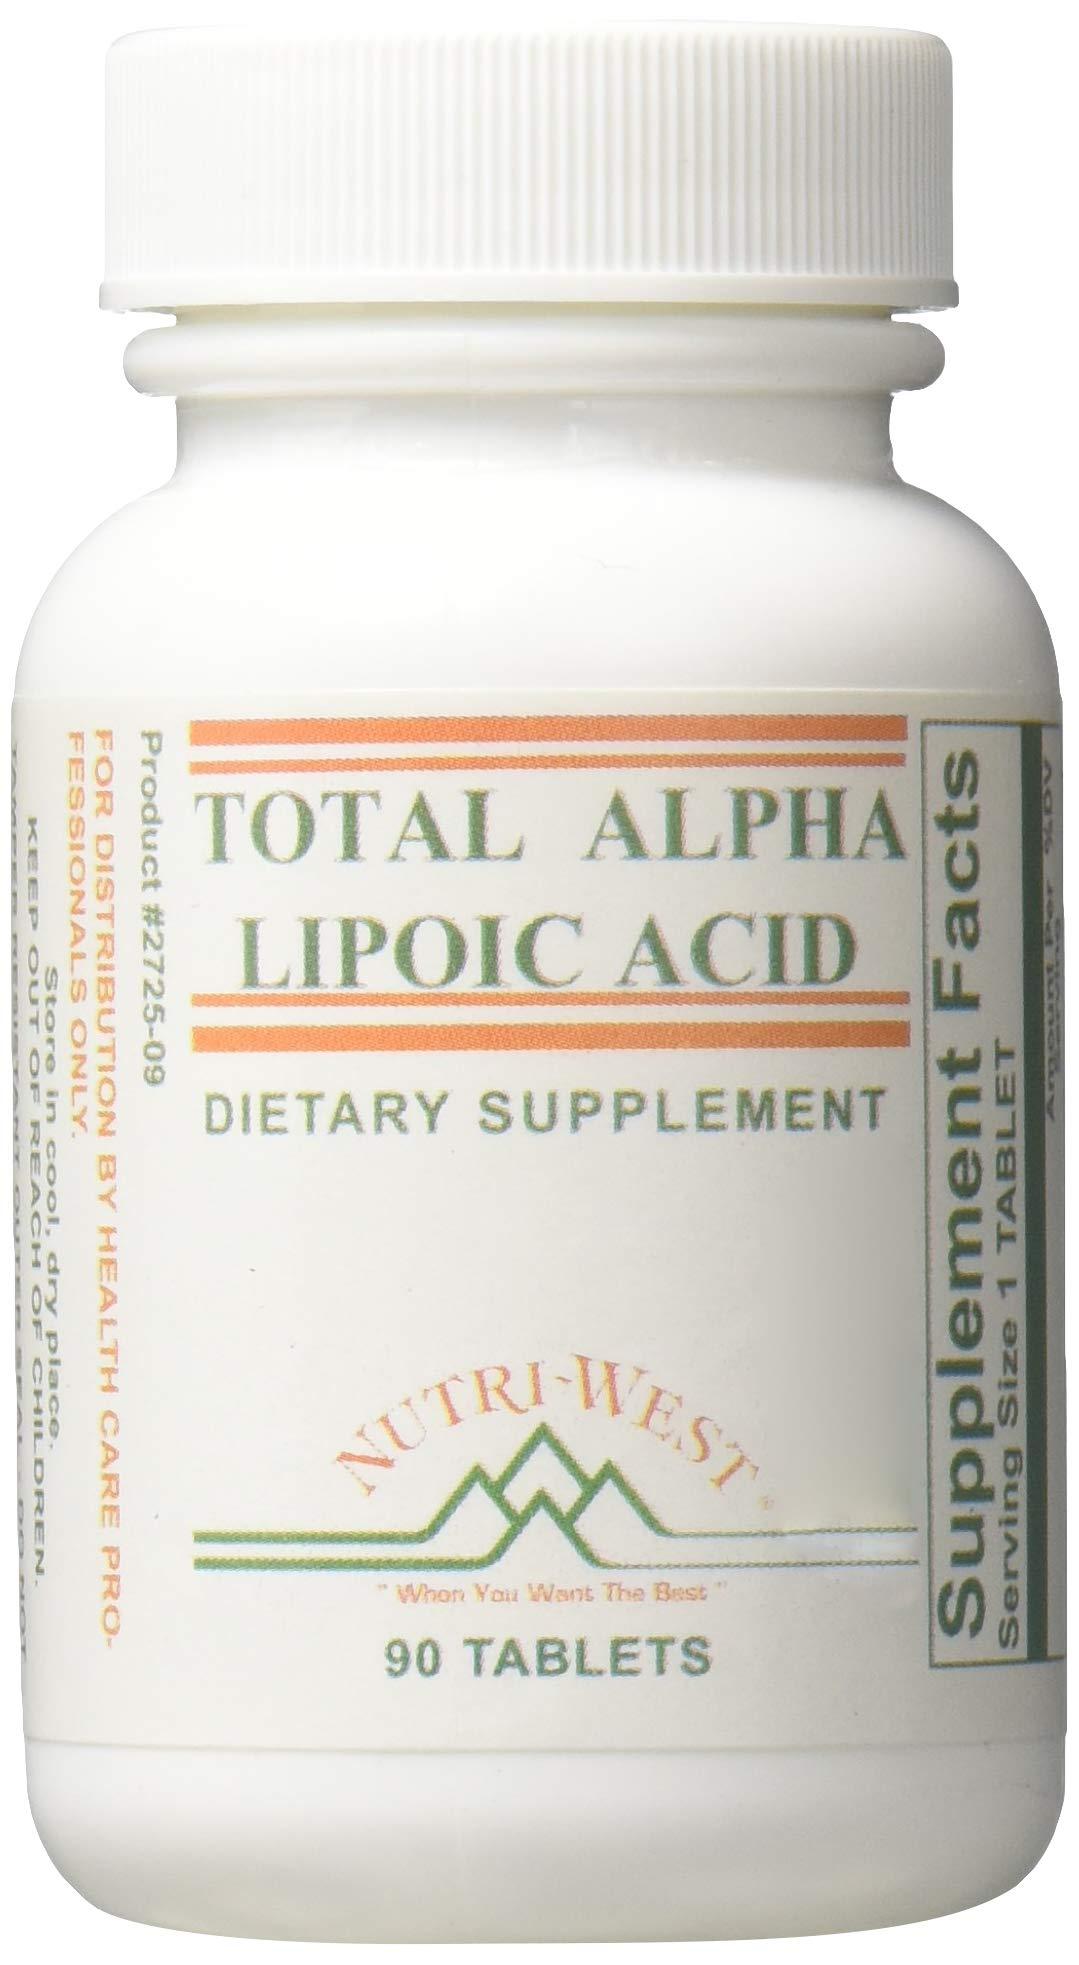 Nutri-West - Total Alpha LIPOIC Acid -90 by Nutri-West